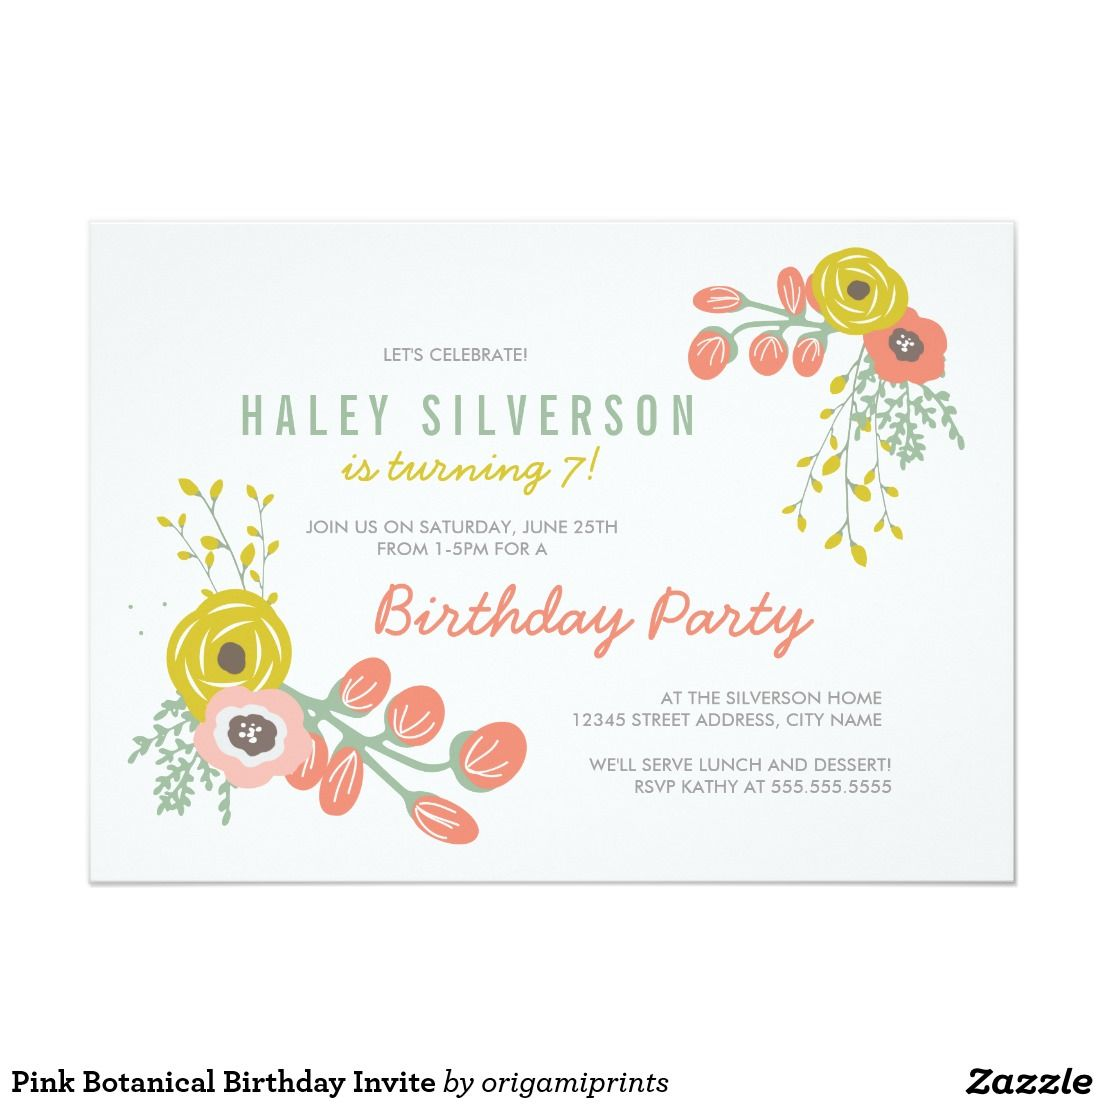 Pink Botanical Birthday Invite | BIRTHDAYS: Floral Invitations ...